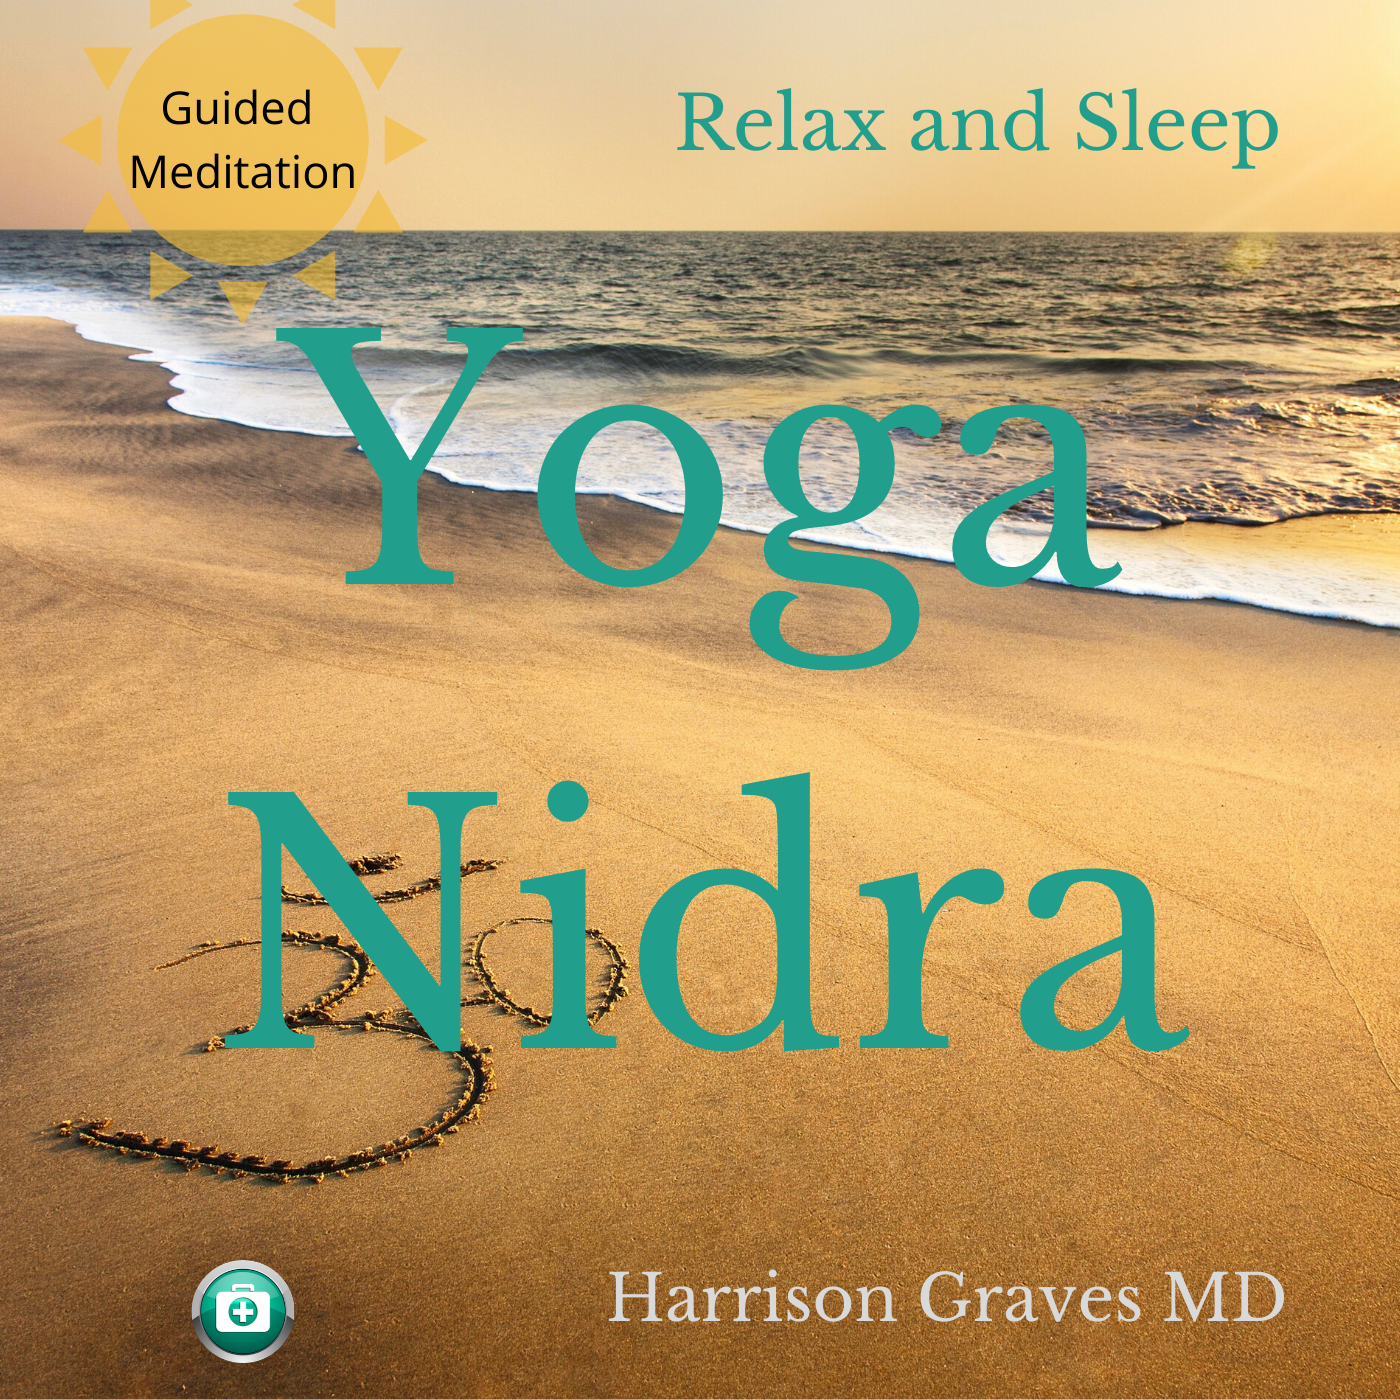 Album Cover/Yoga Nidra